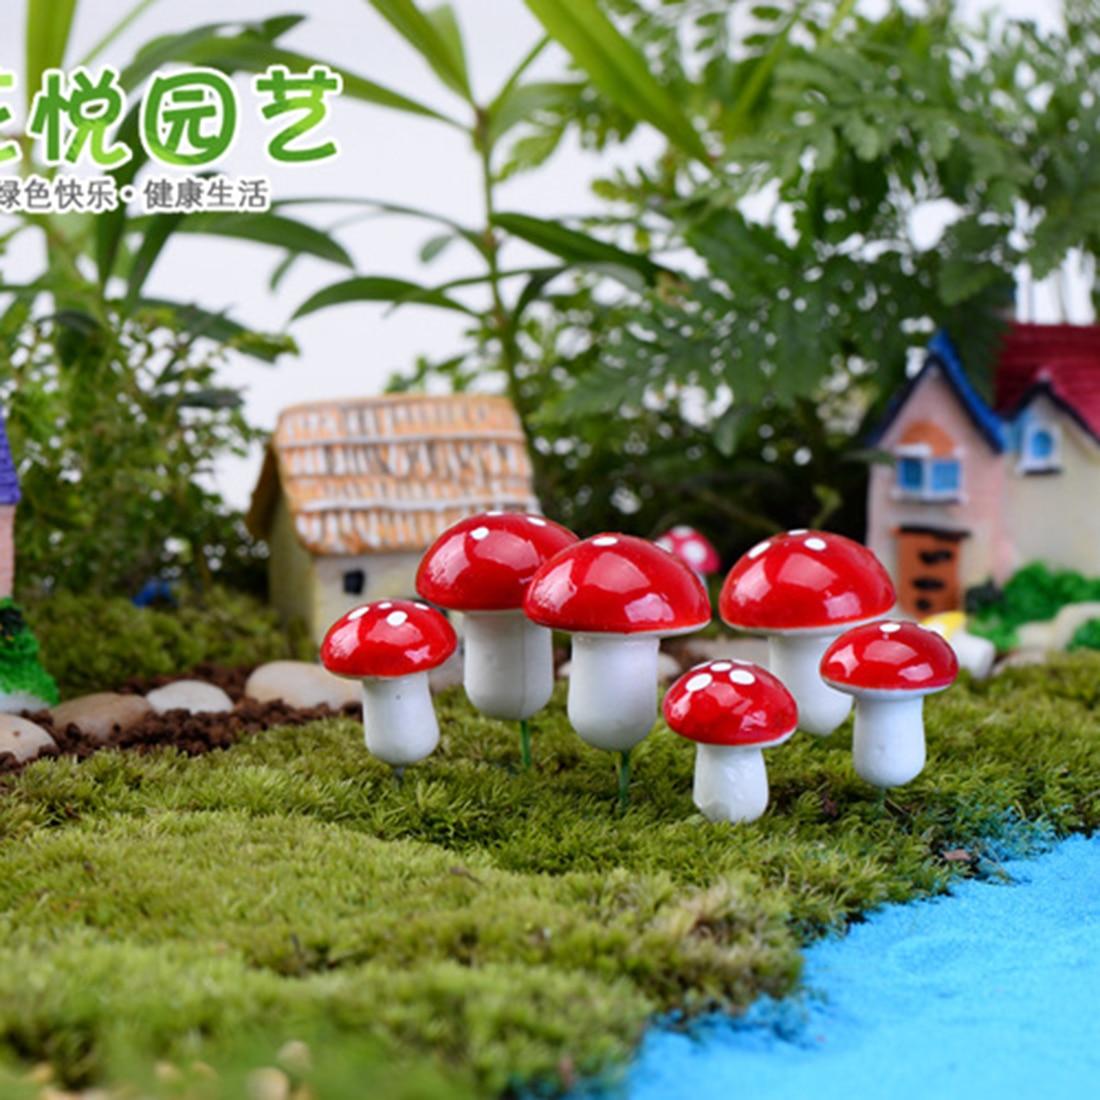 Aliexpress.com : Buy New 10Pcs Mini Red Mushroom Garden Ornament Miniature  Plant Pots Fairy DIY Dollhouse From Reliable Pot Creativity Suppliers On  Shenzhen ...